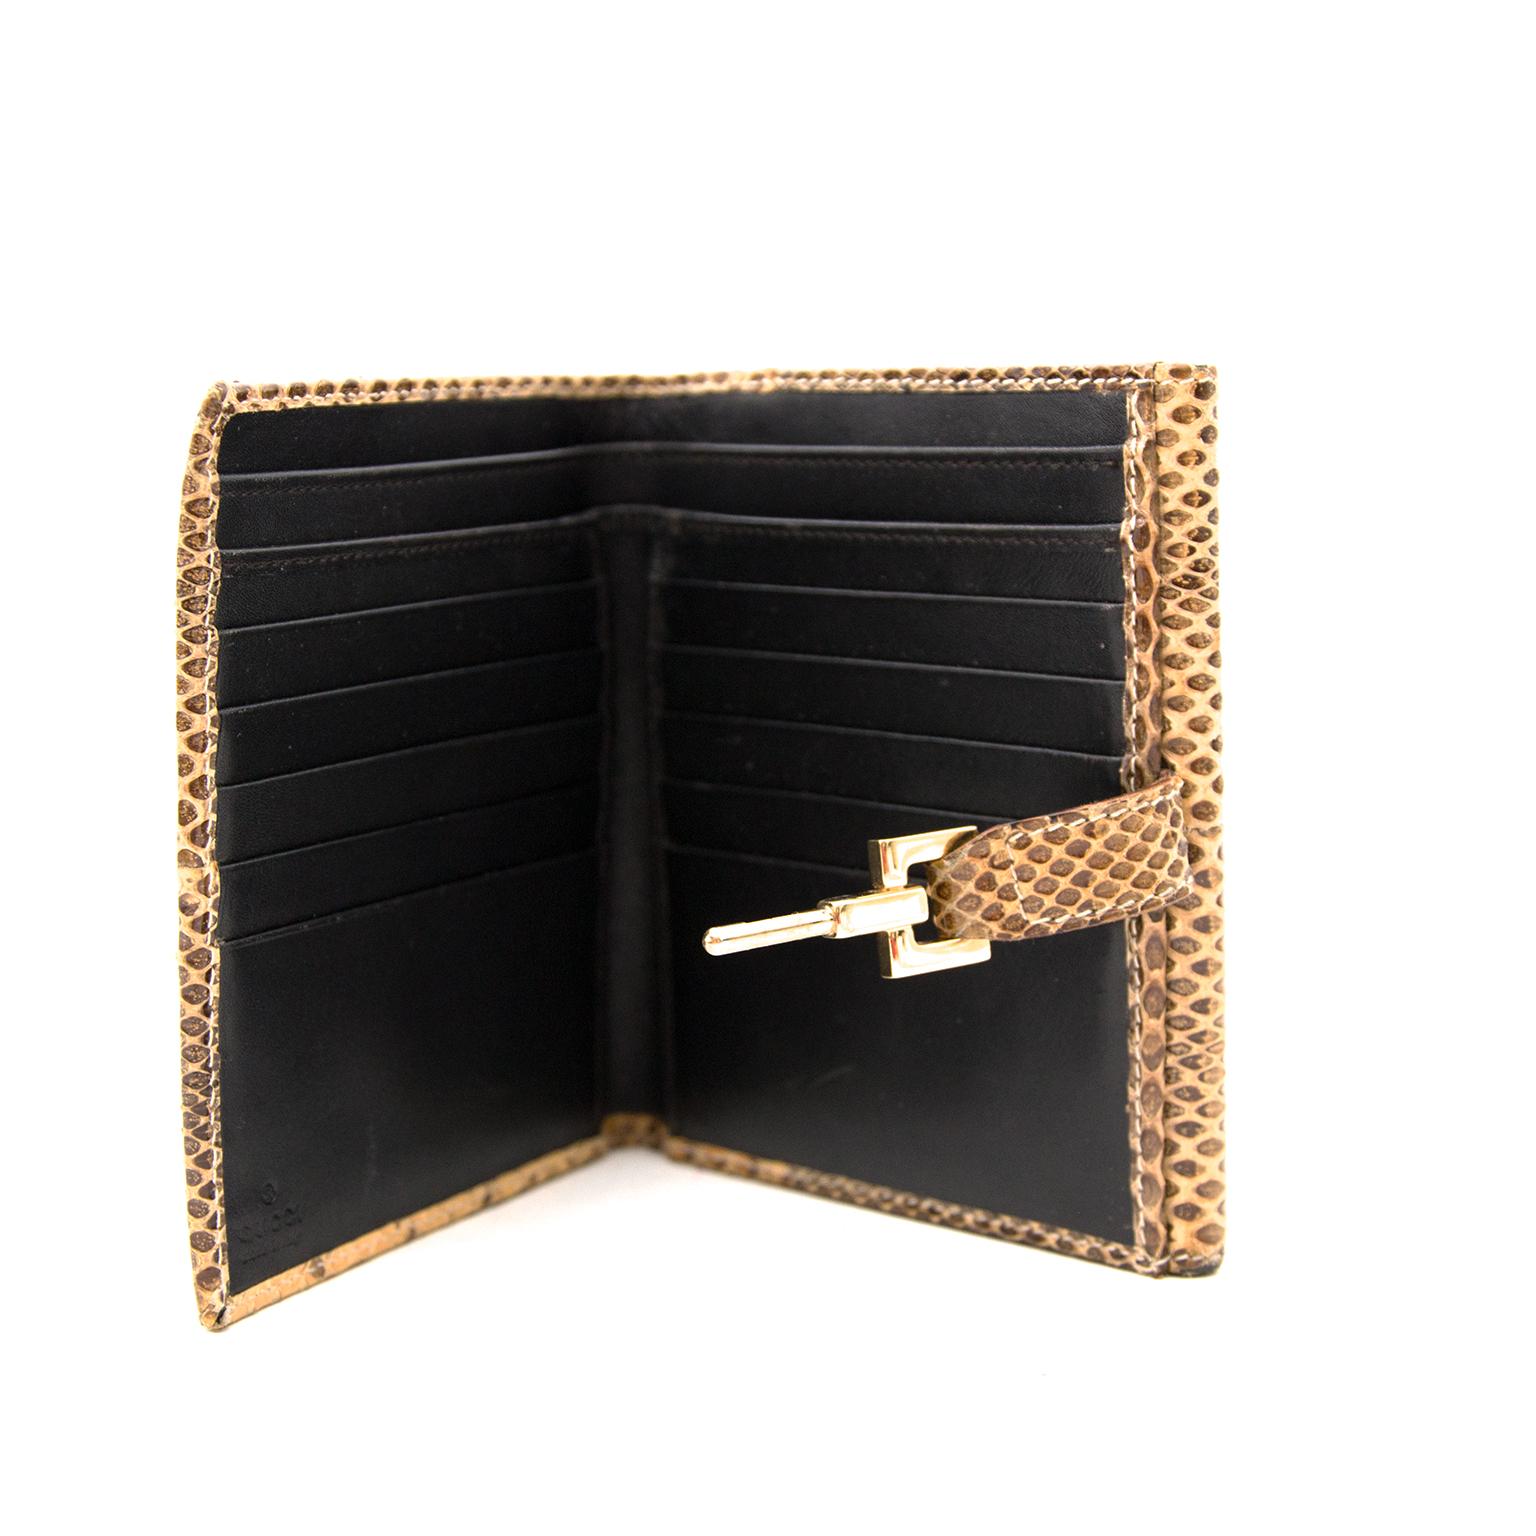 Acheter Gucci Snakeskin Lock Wallet en ligne